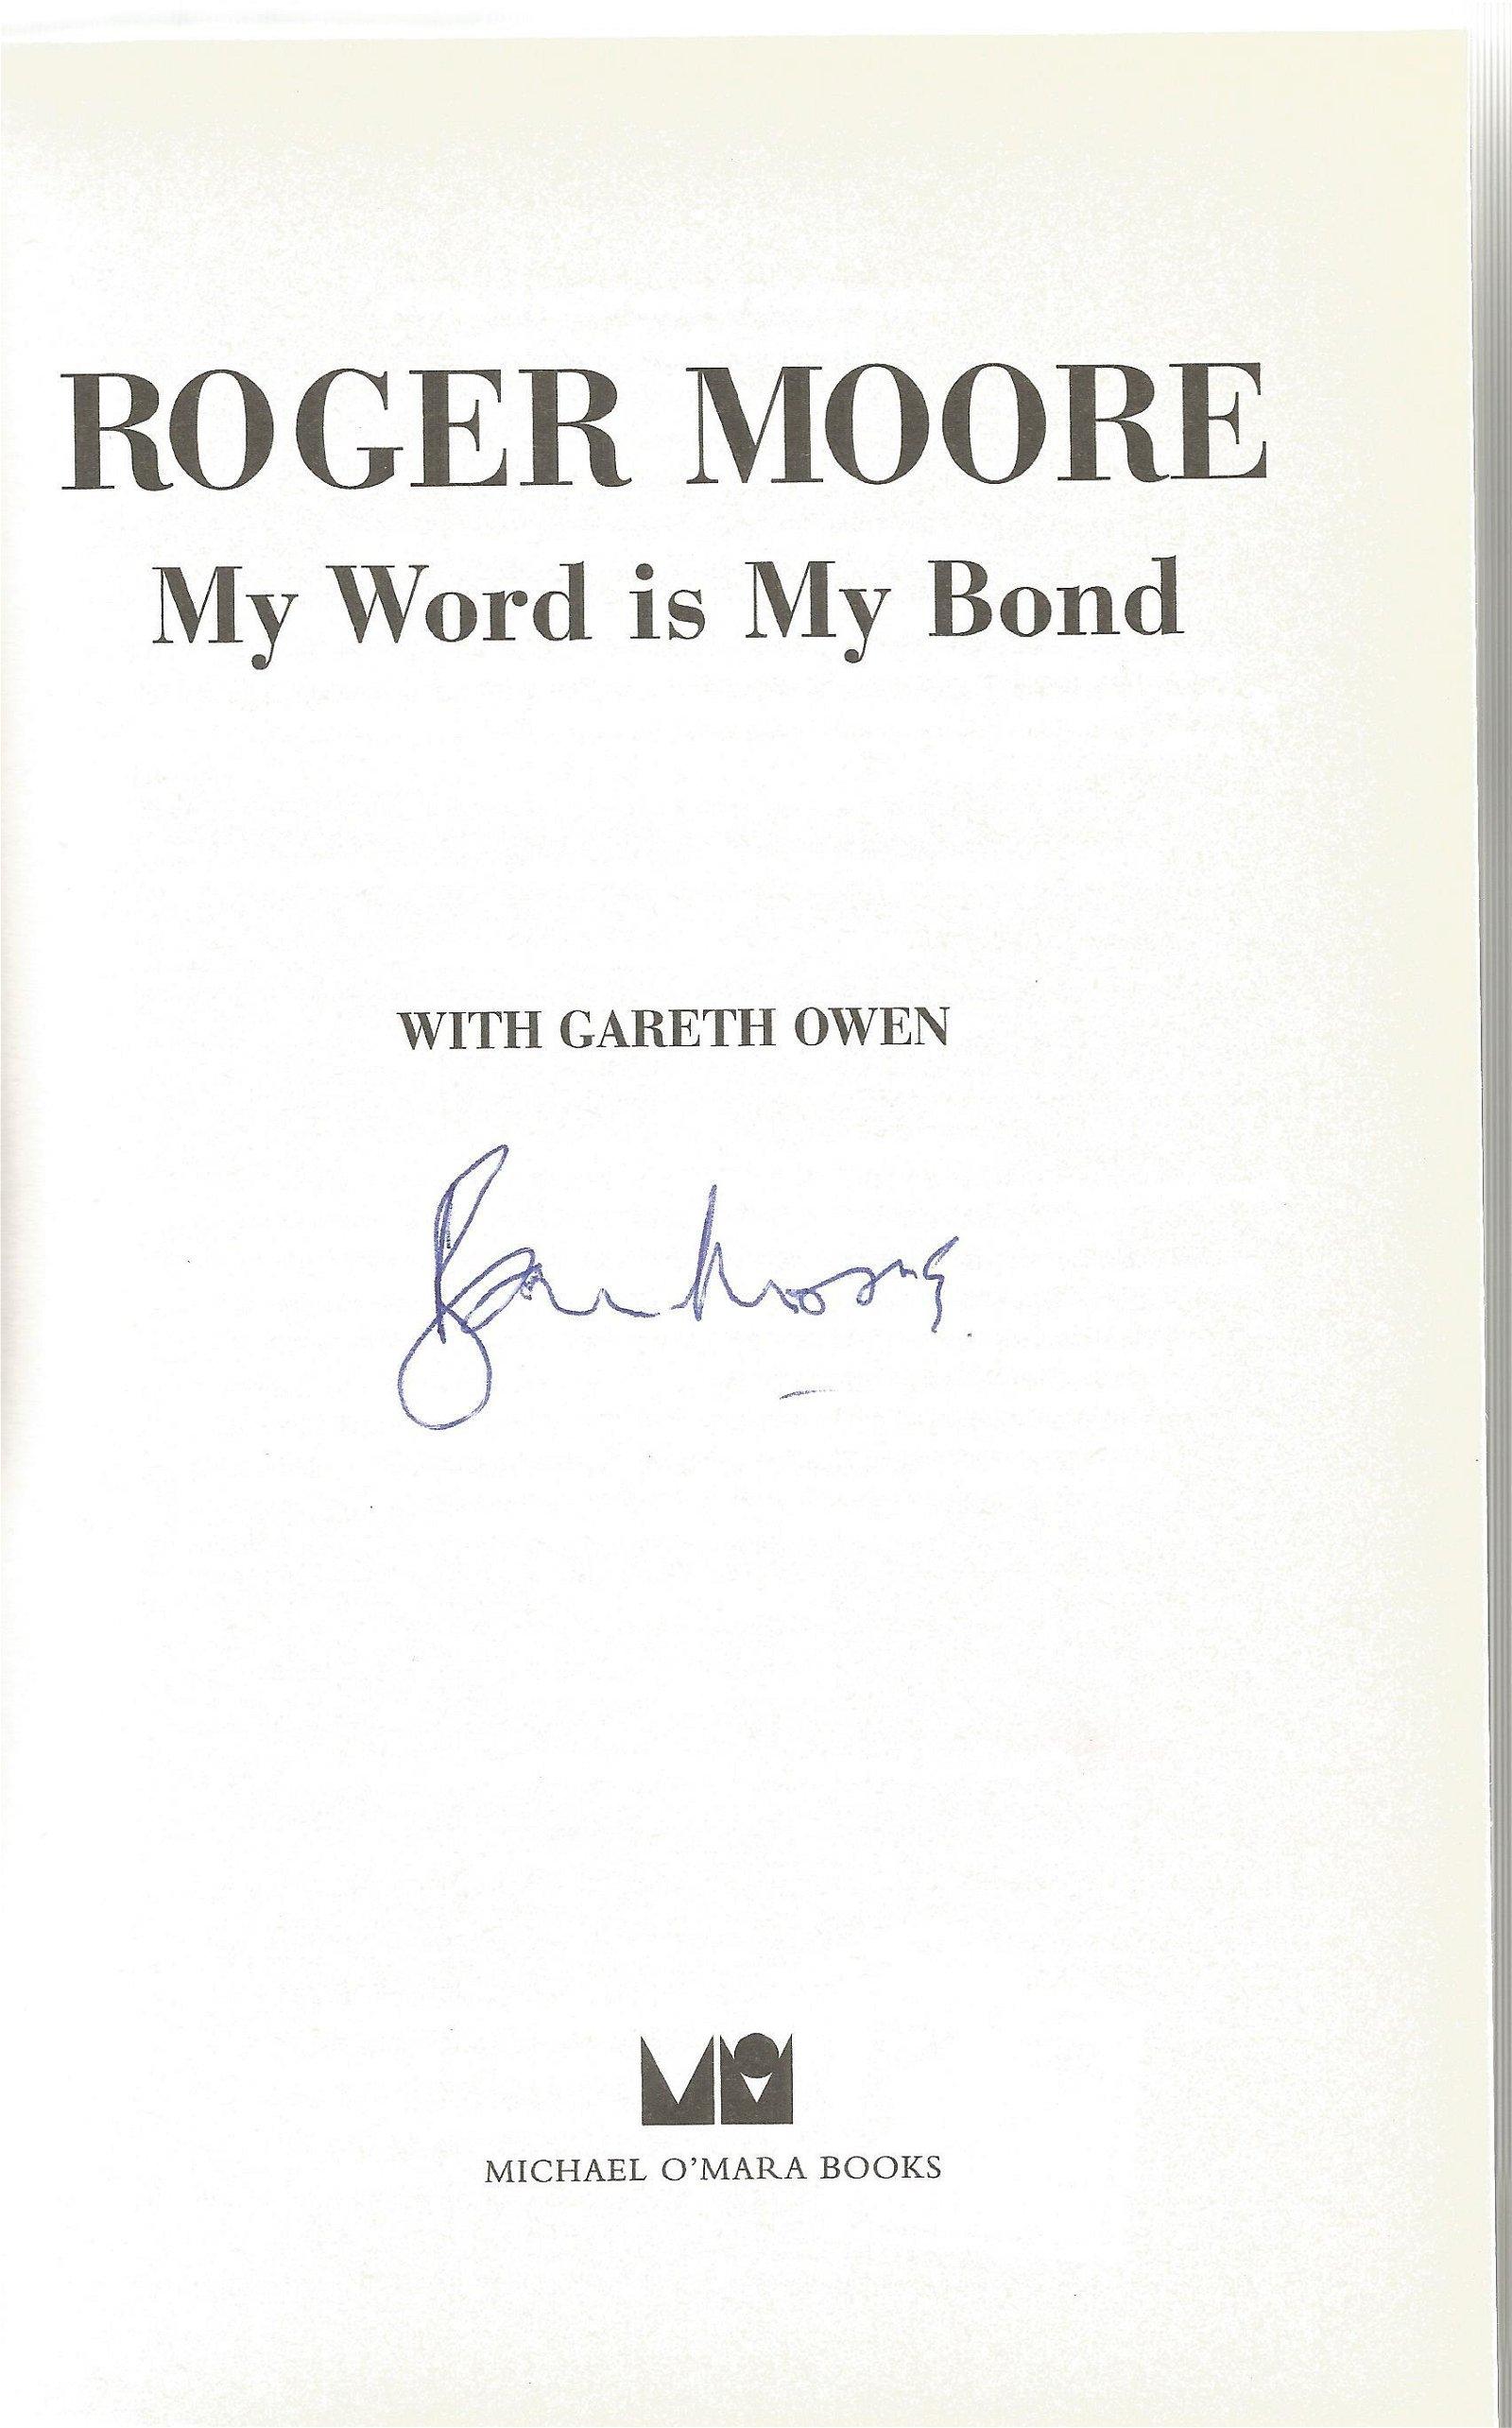 Roger Moore signed My Word is My Bond hardback book.